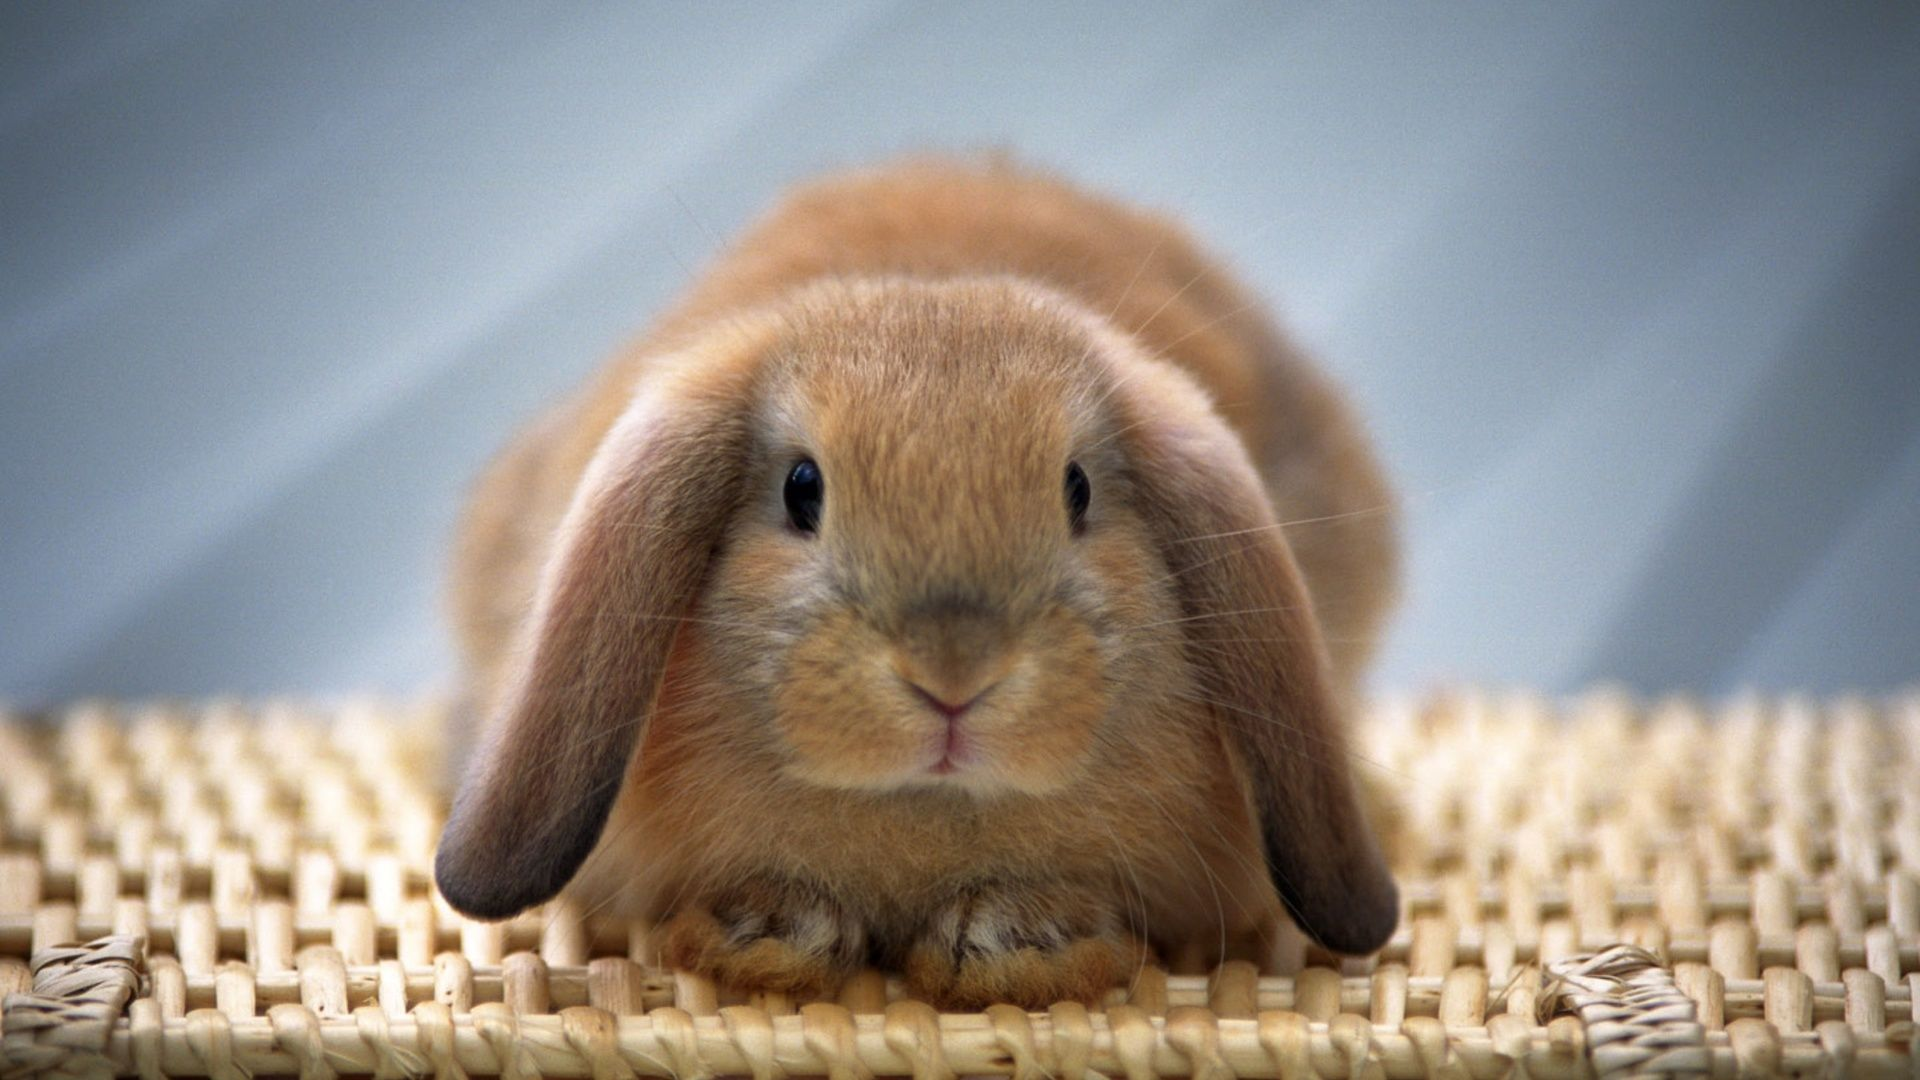 Bunny new wallpaper